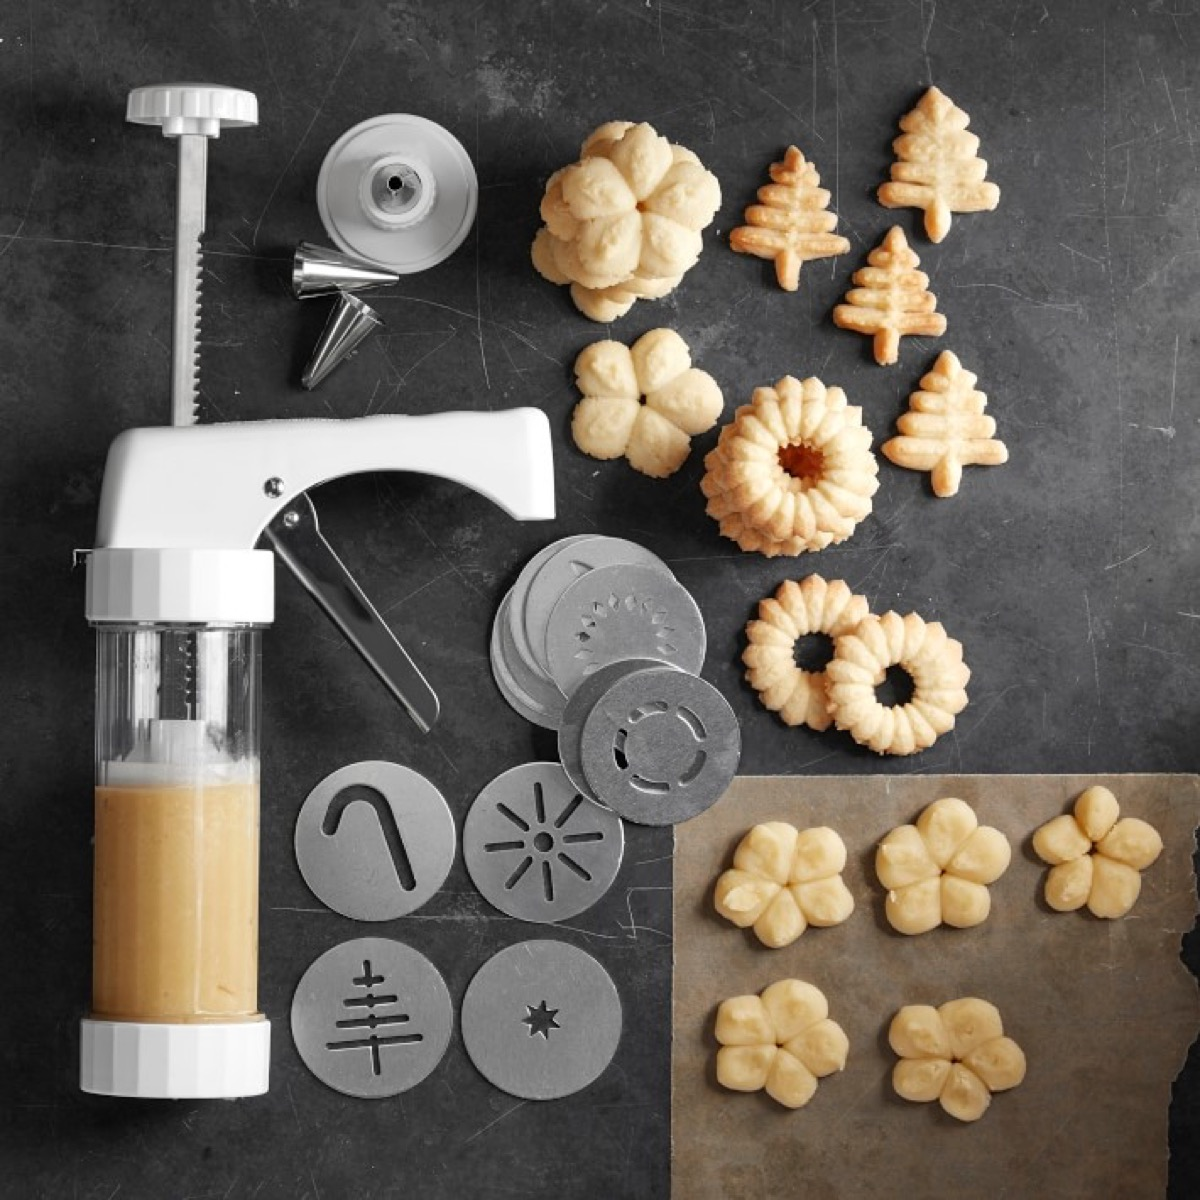 Cookie press with sample cookies